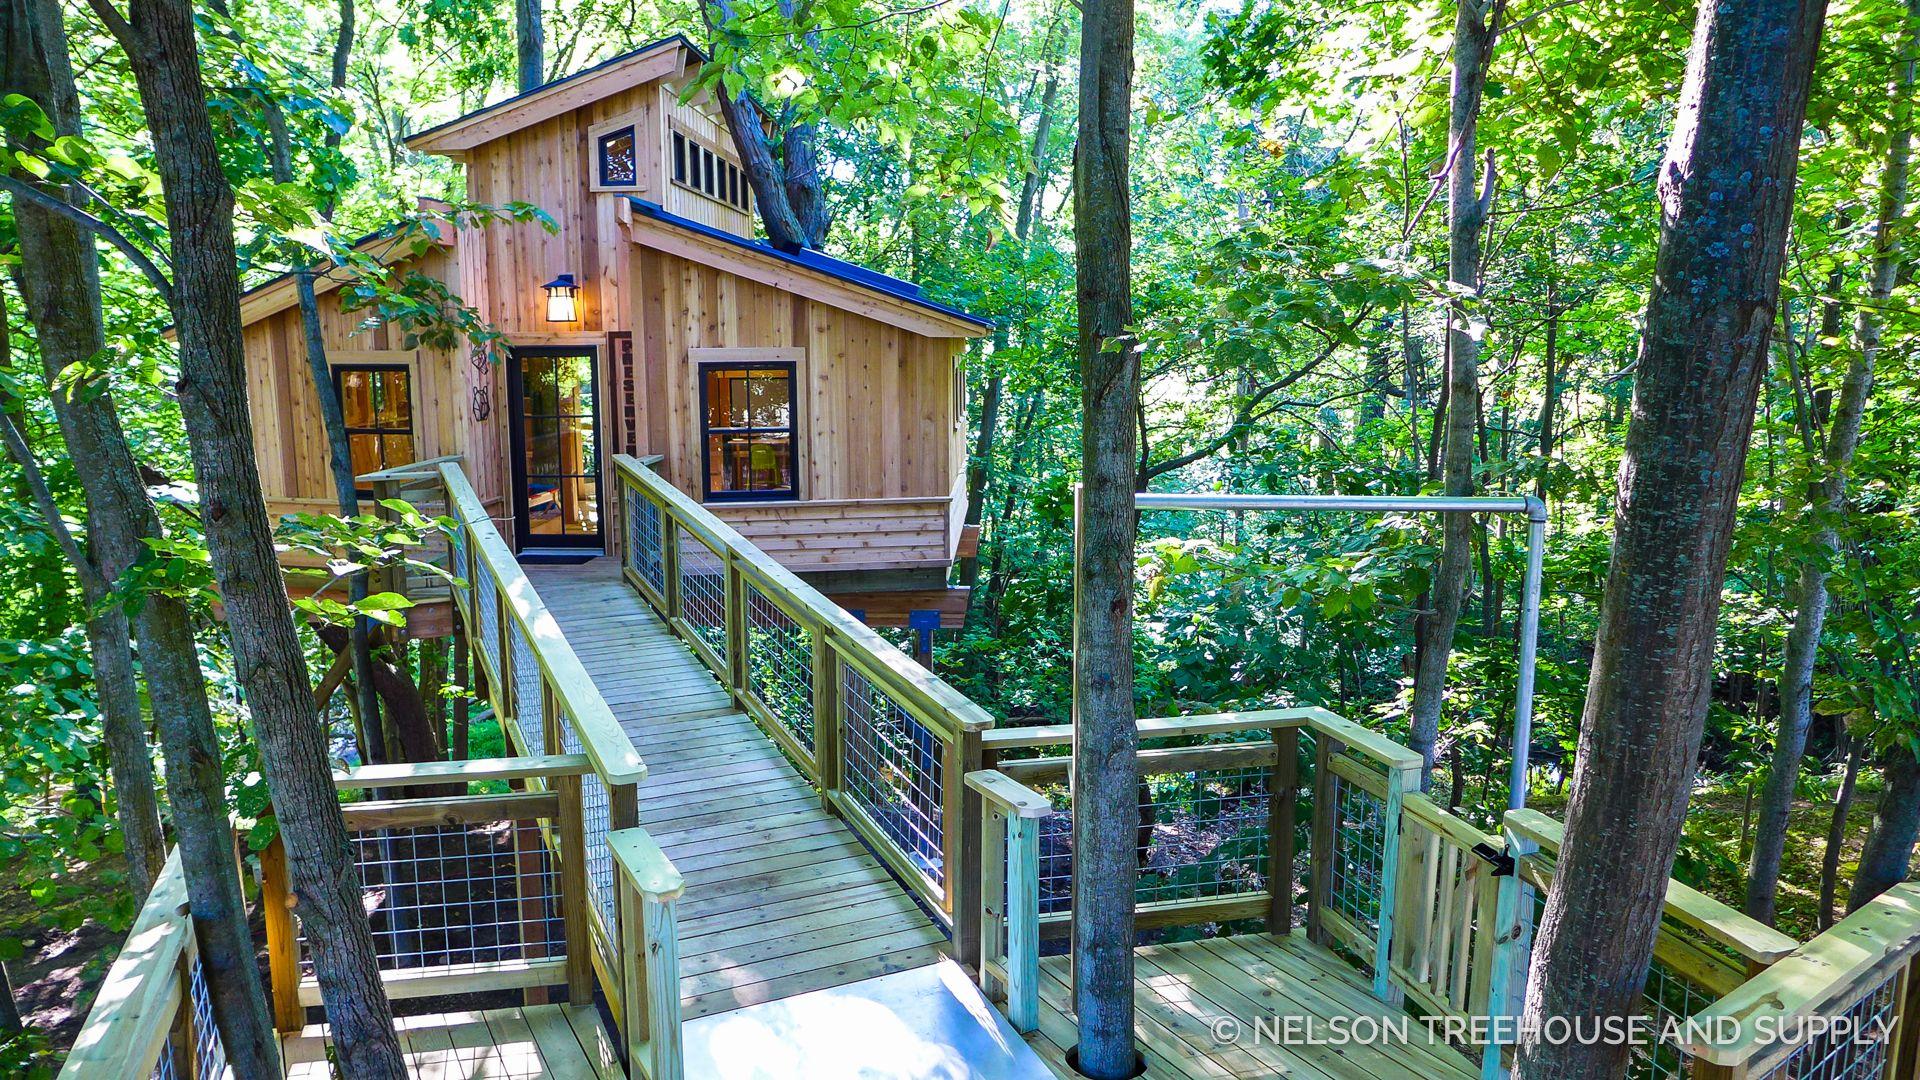 treehouses swenson say fag233t